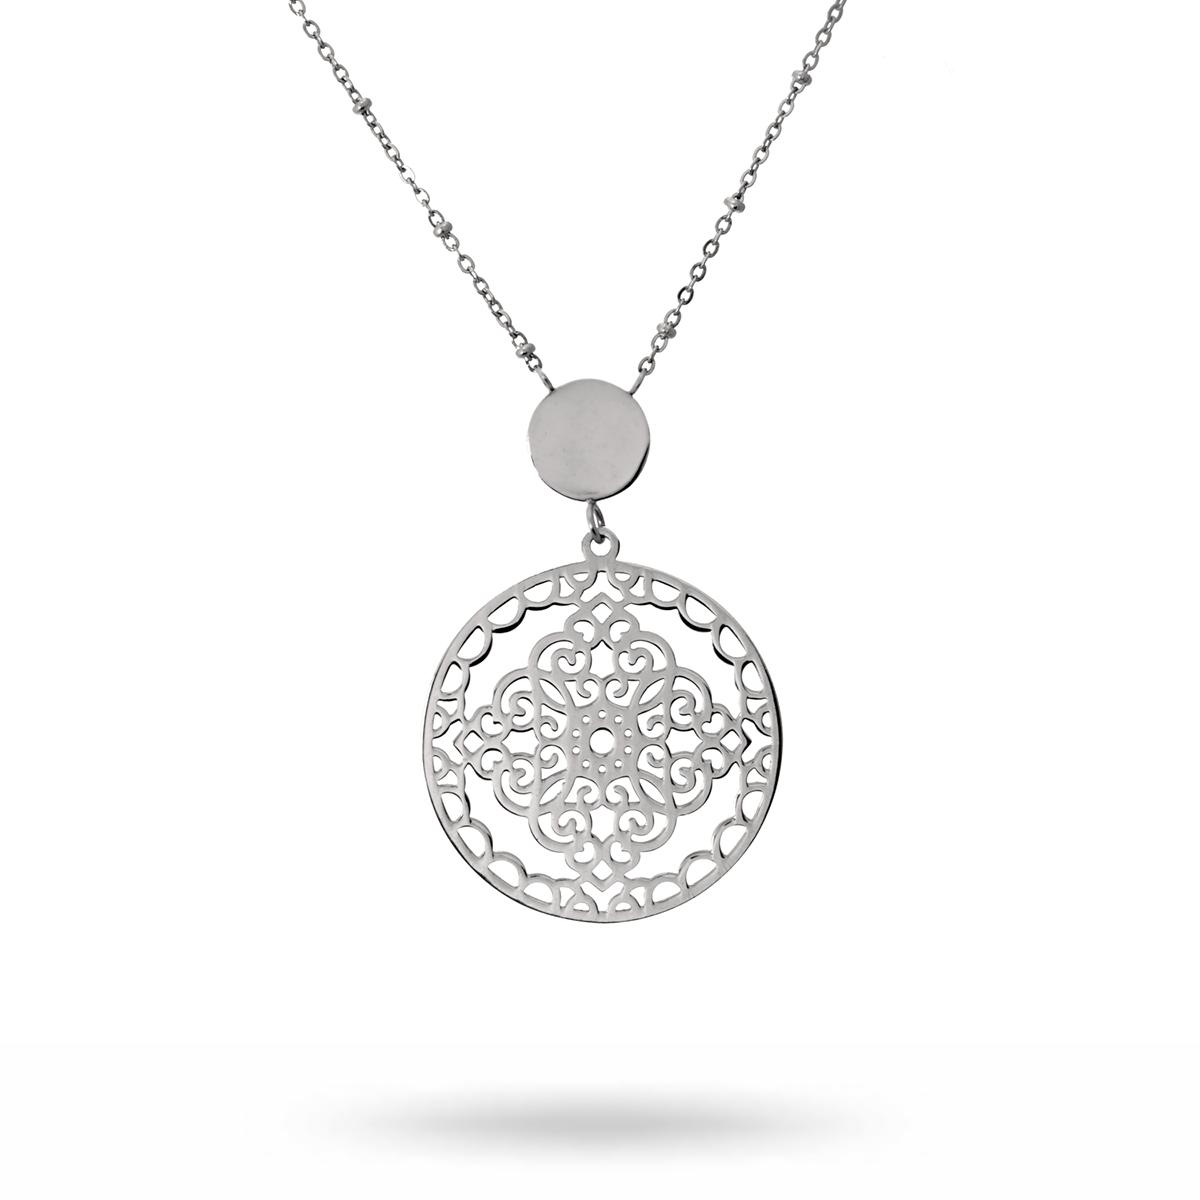 Steffi-necklace-steel